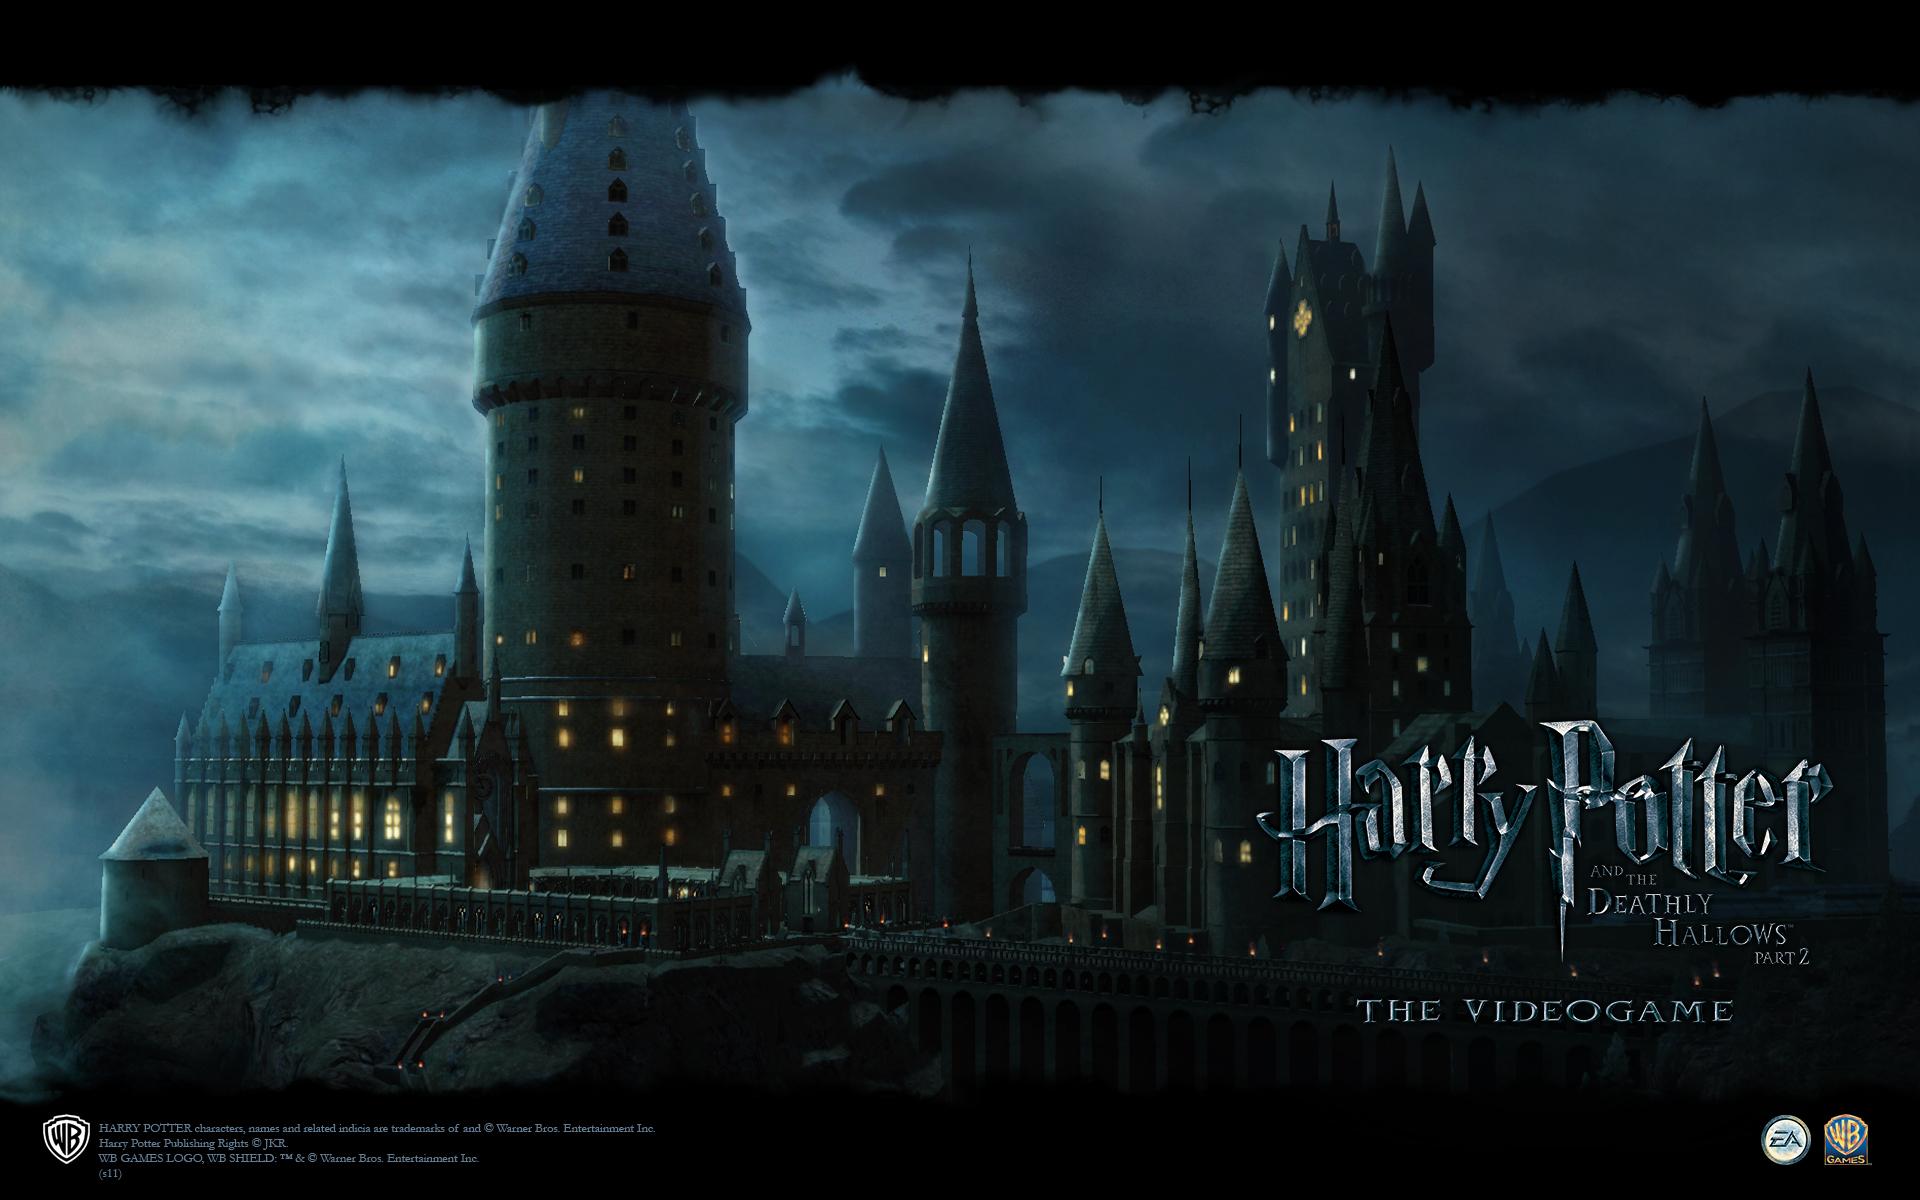 Hogwarts [wide] 1920x1200